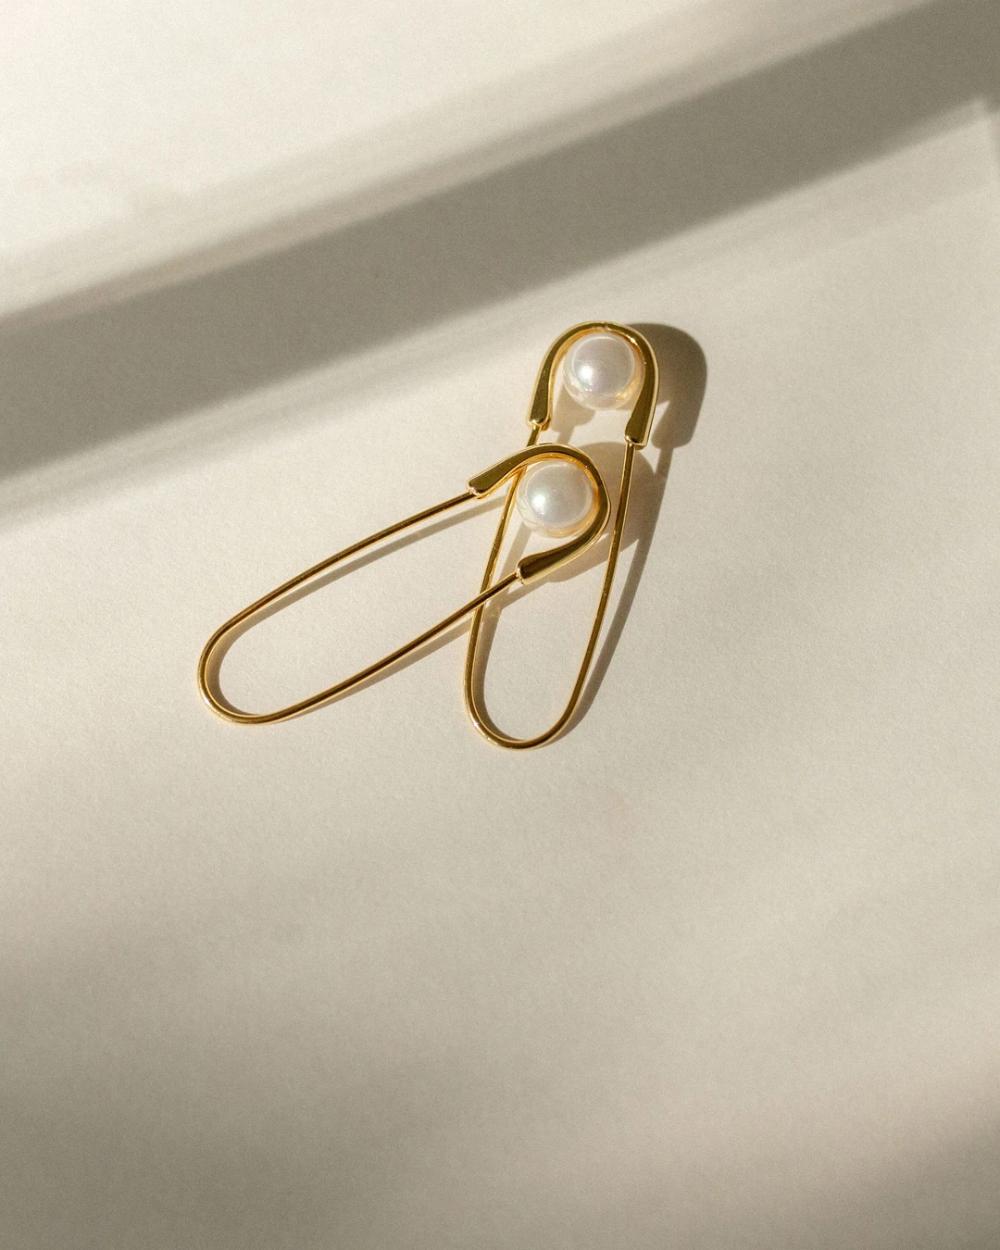 Safety Pin Earrings in 2020 Safety pin earrings, Black